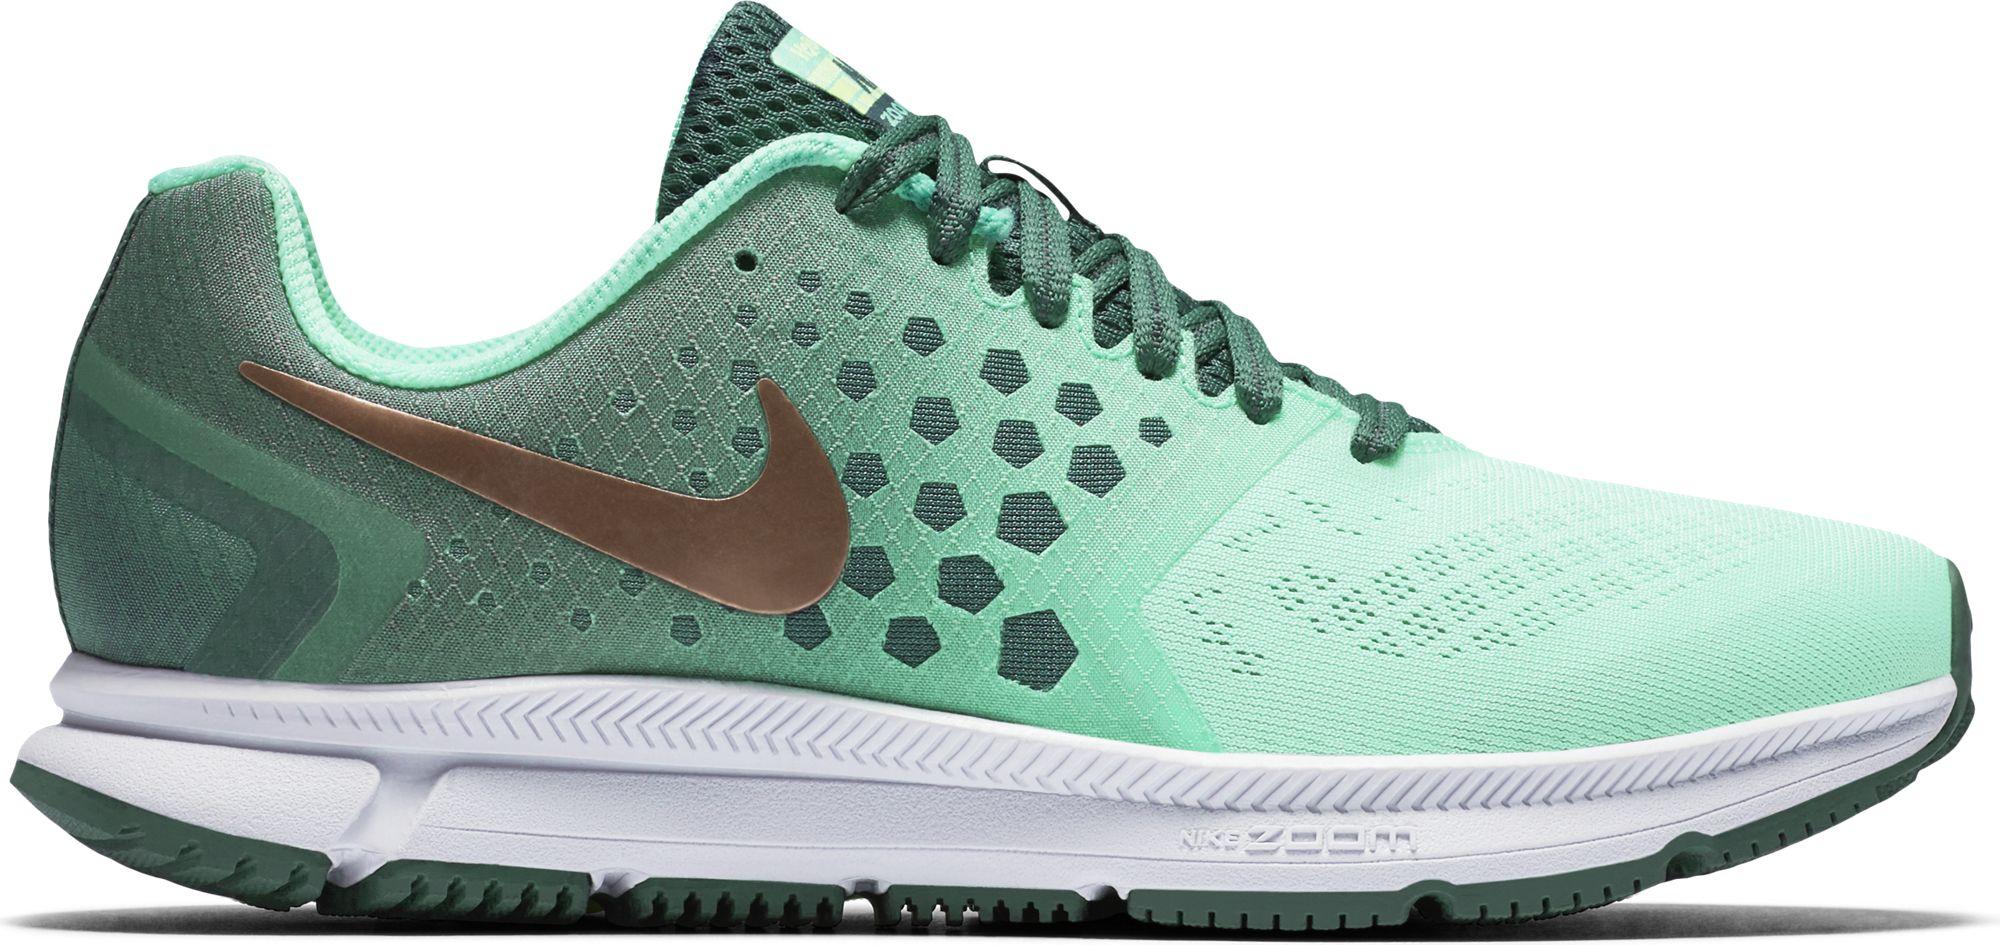 Nike Zoom Air Air Zoom Shield Nike Span Span Shield S5ccYq